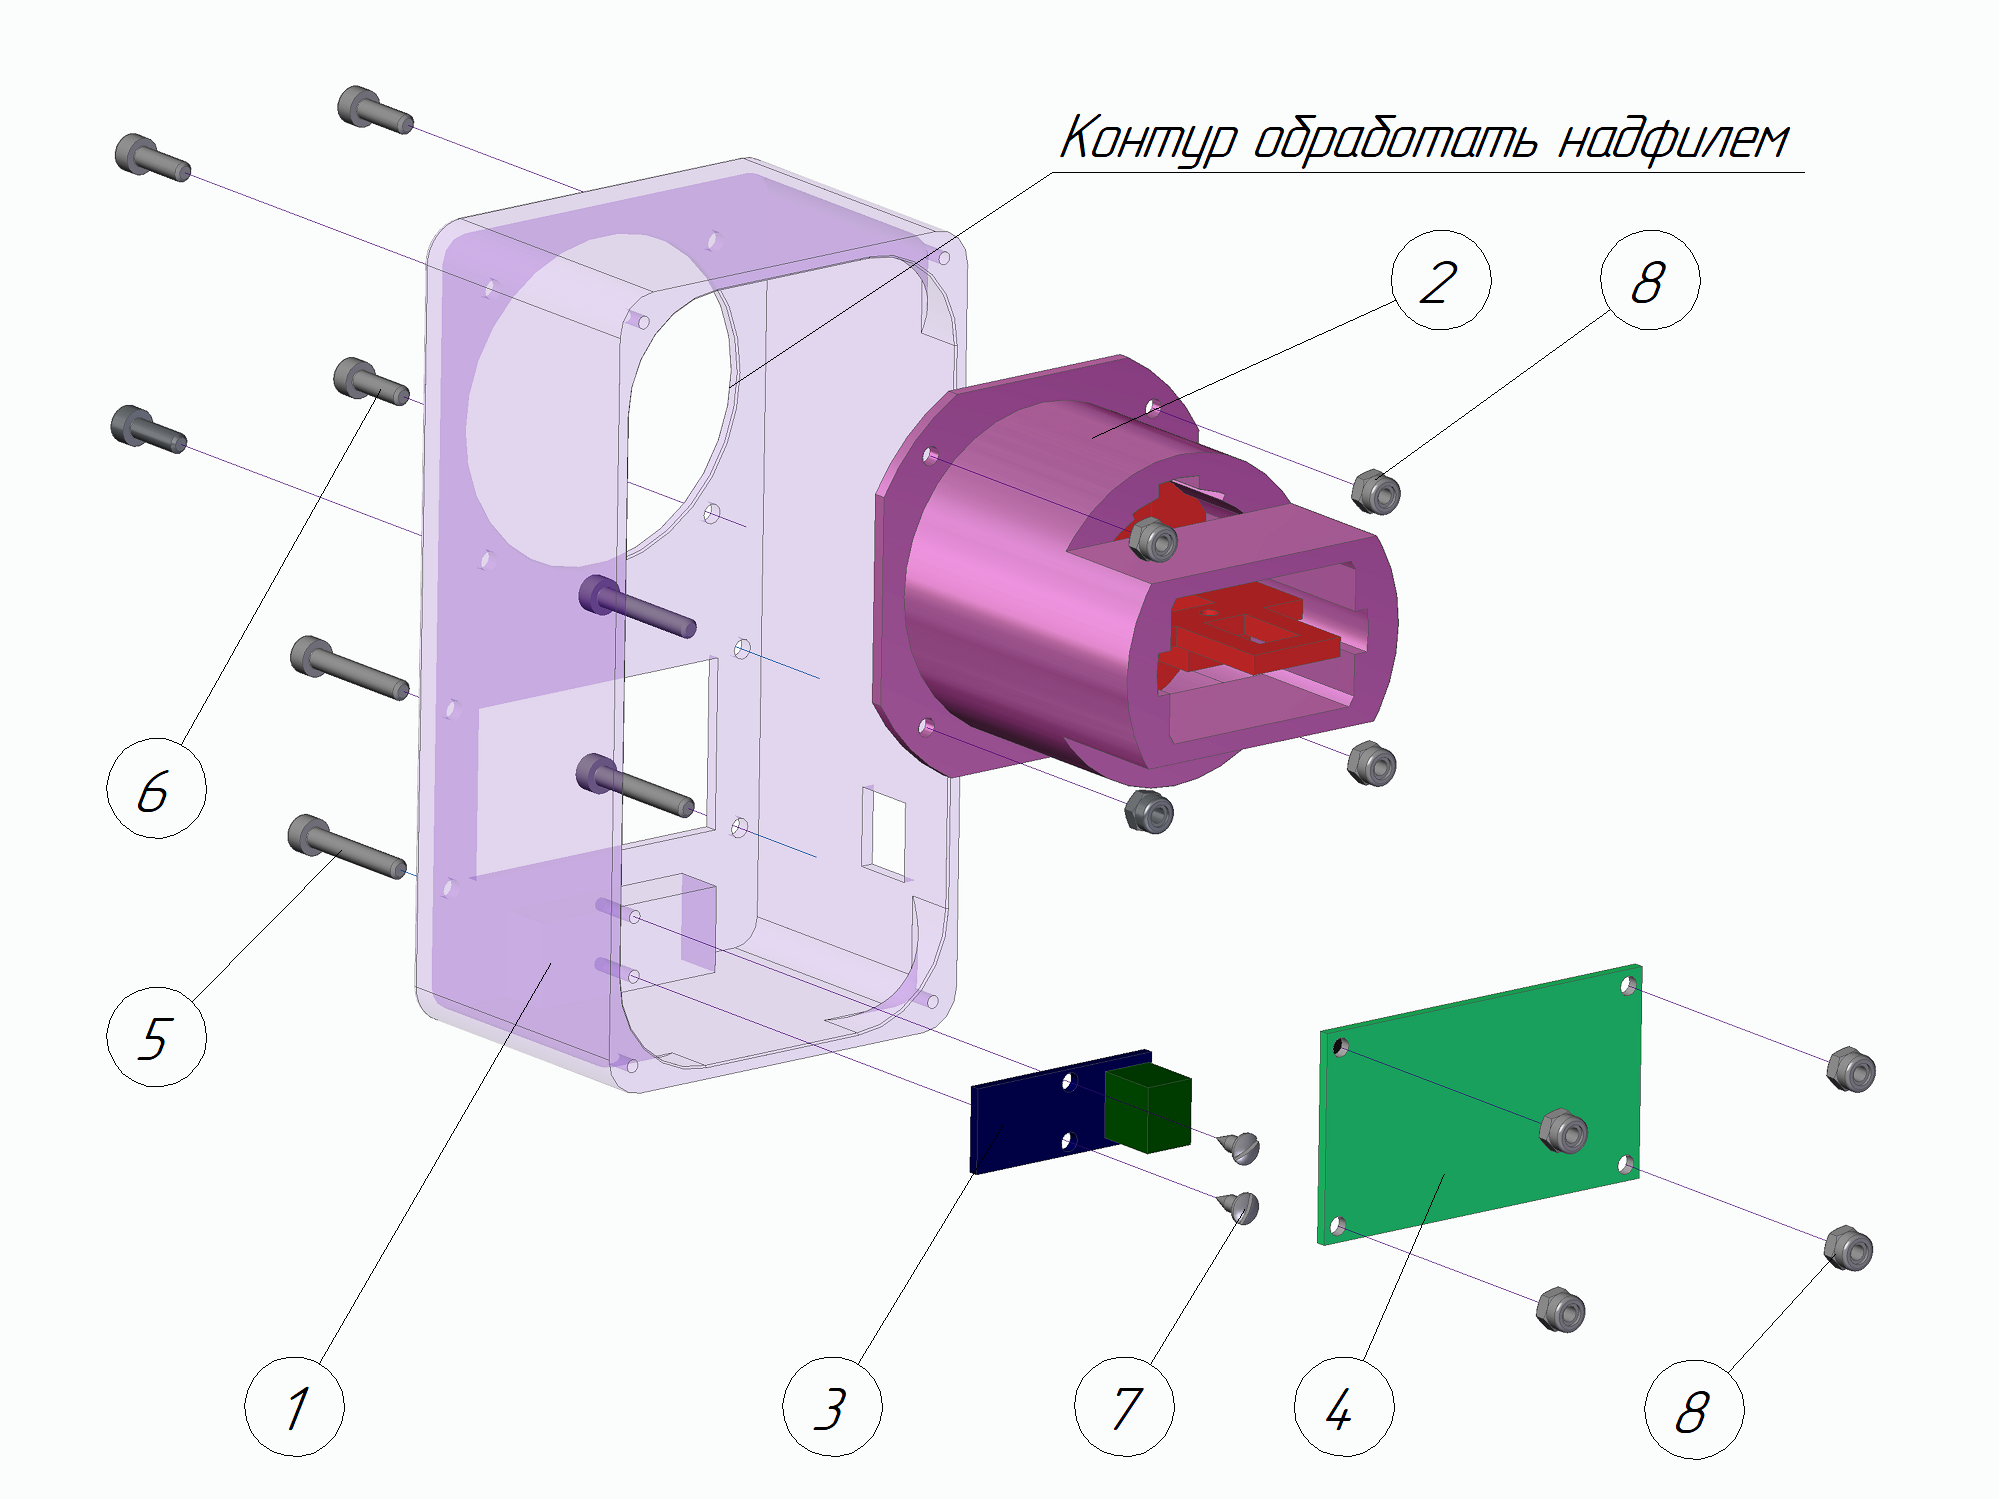 step-6-image-1